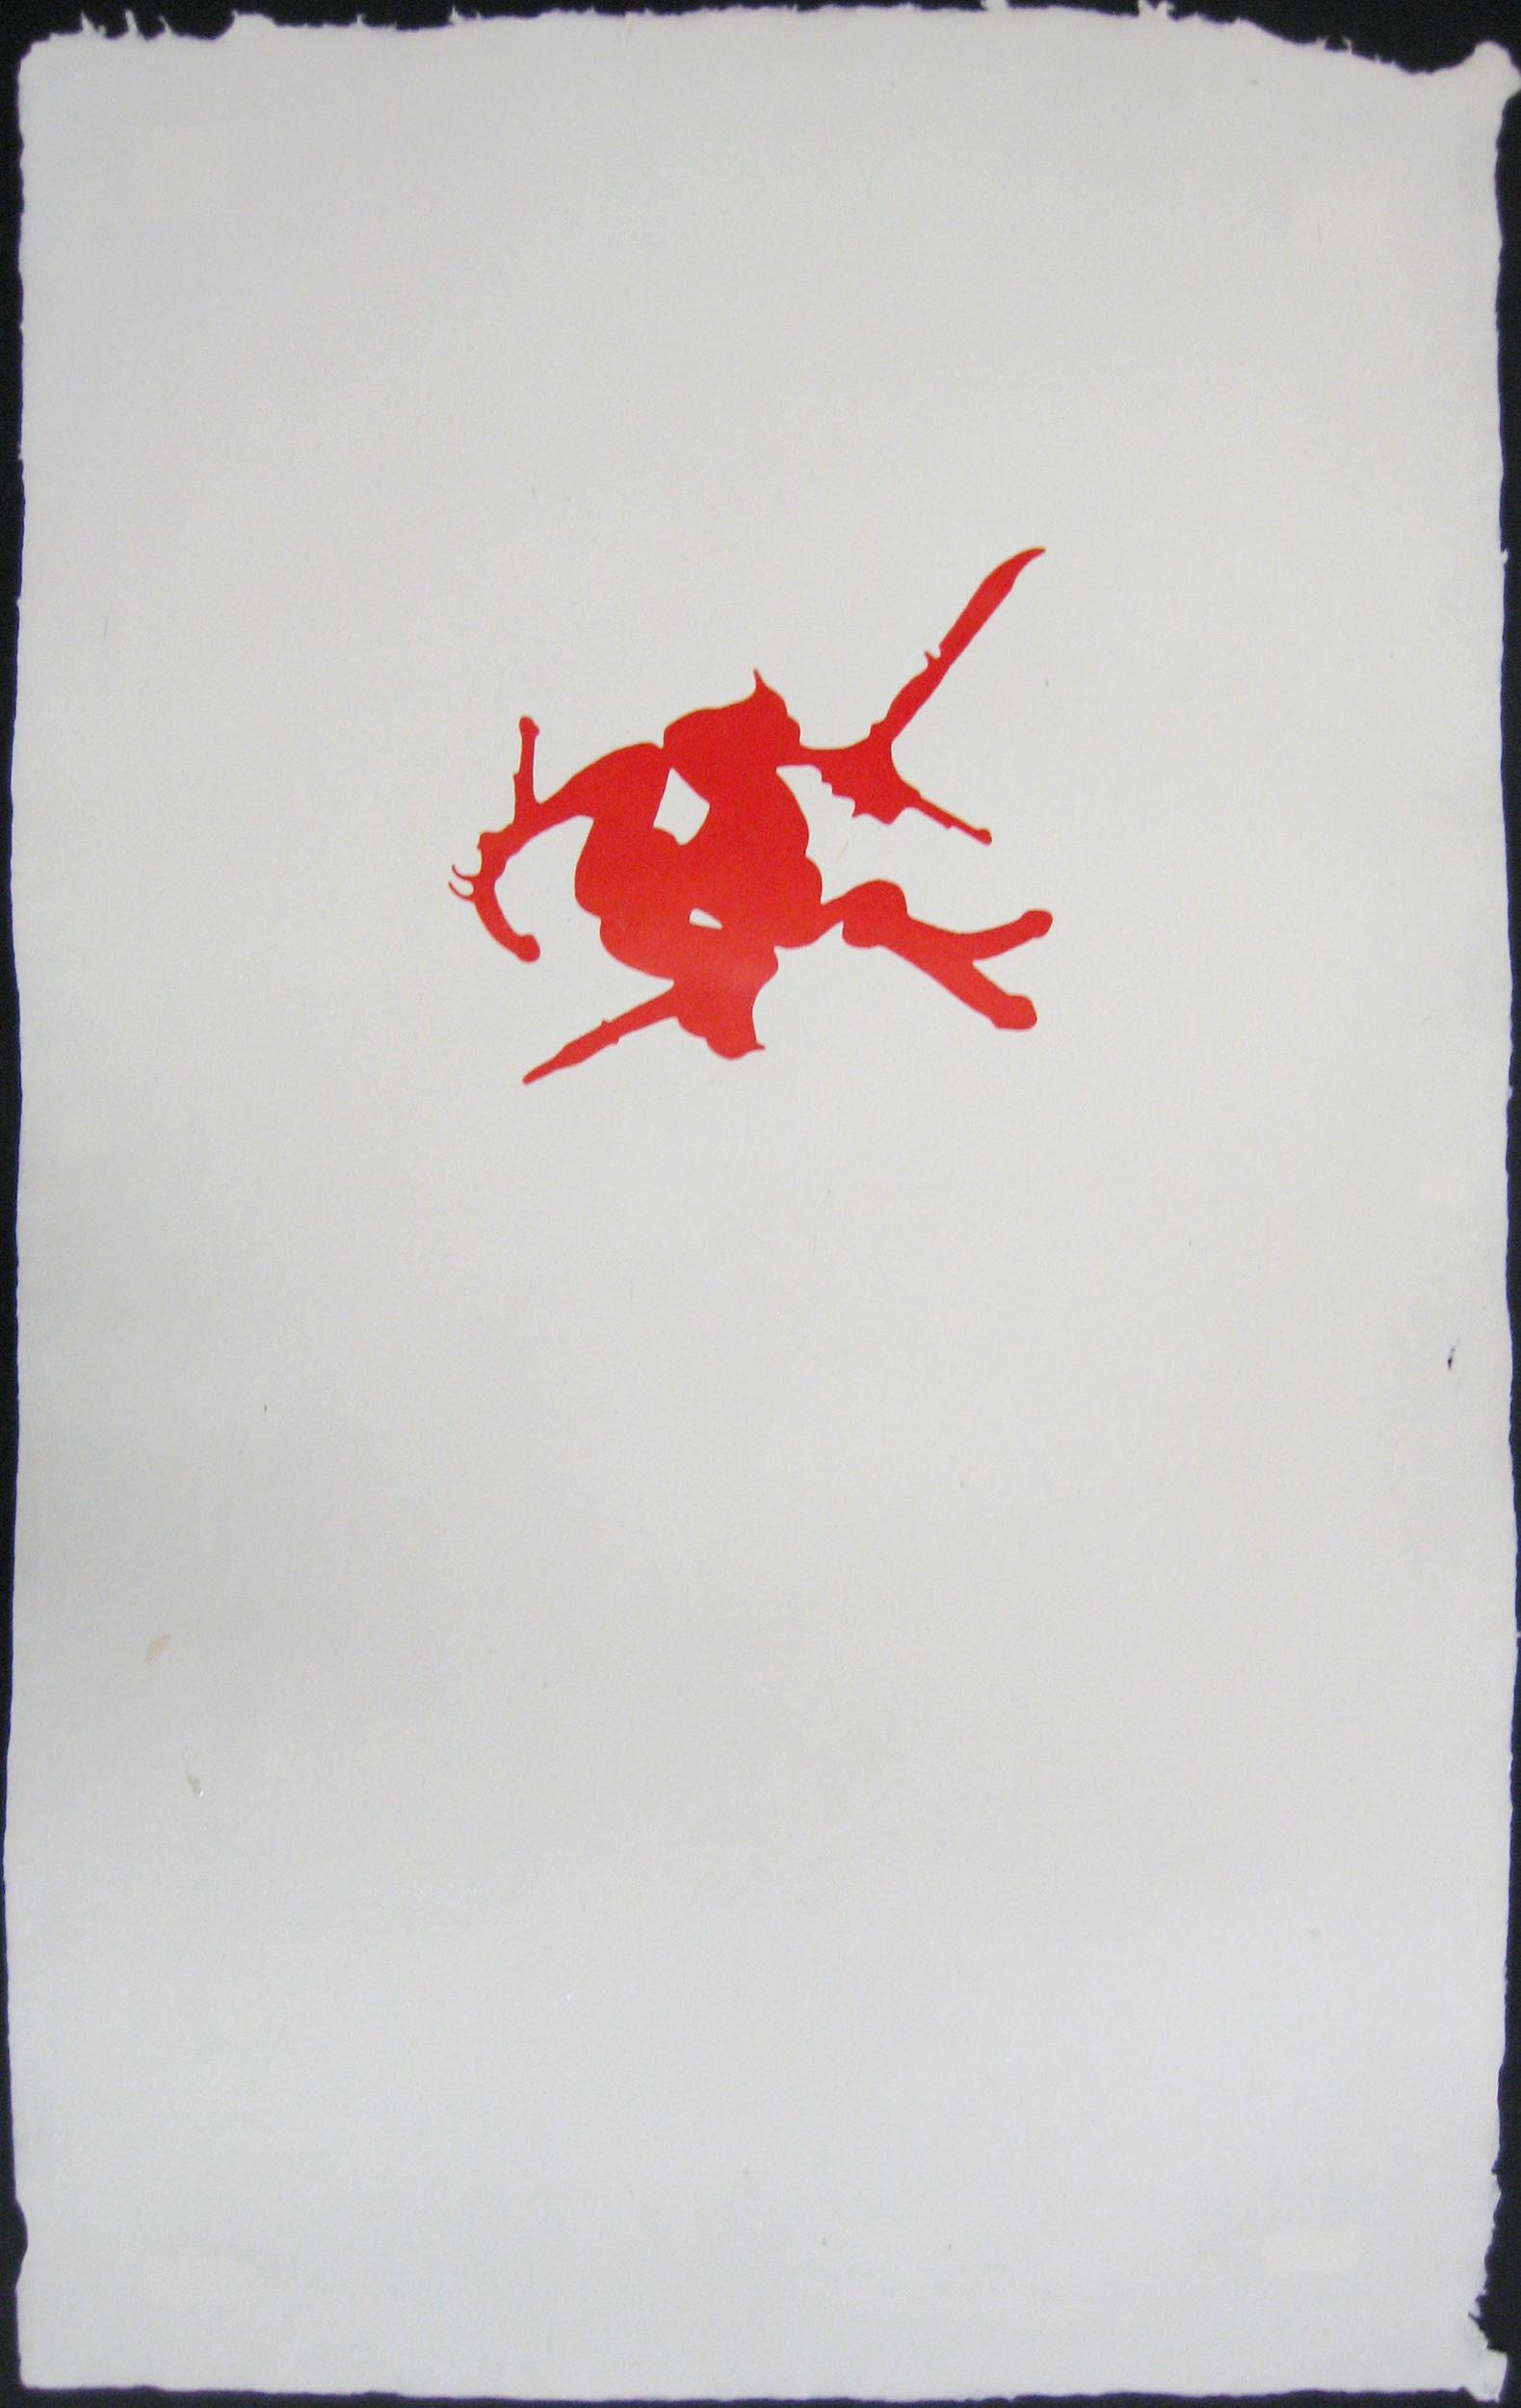 spinnersspinning-red-2-of-5-by-anna-tsantir-2009_5346787432_o.jpg